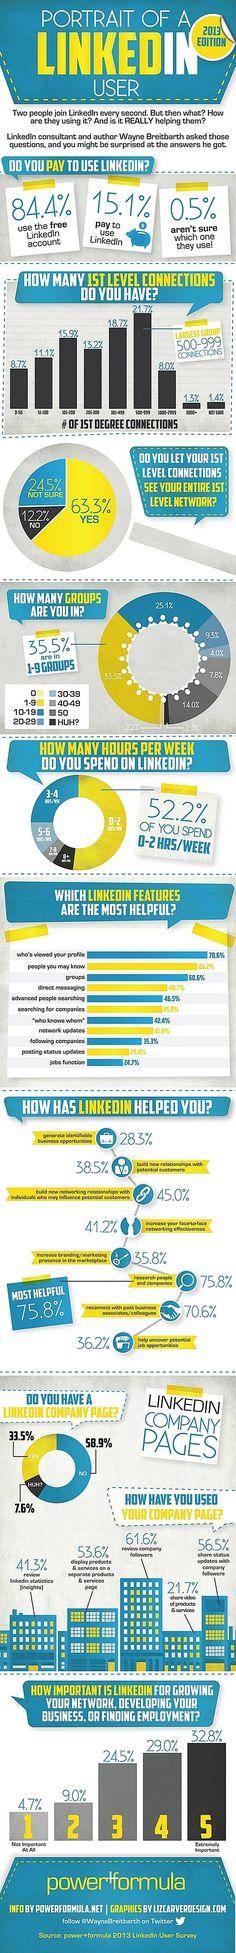 How Do People Really Use #LinkedIn #Infographic via @Viveka Smith Smith von Rosen